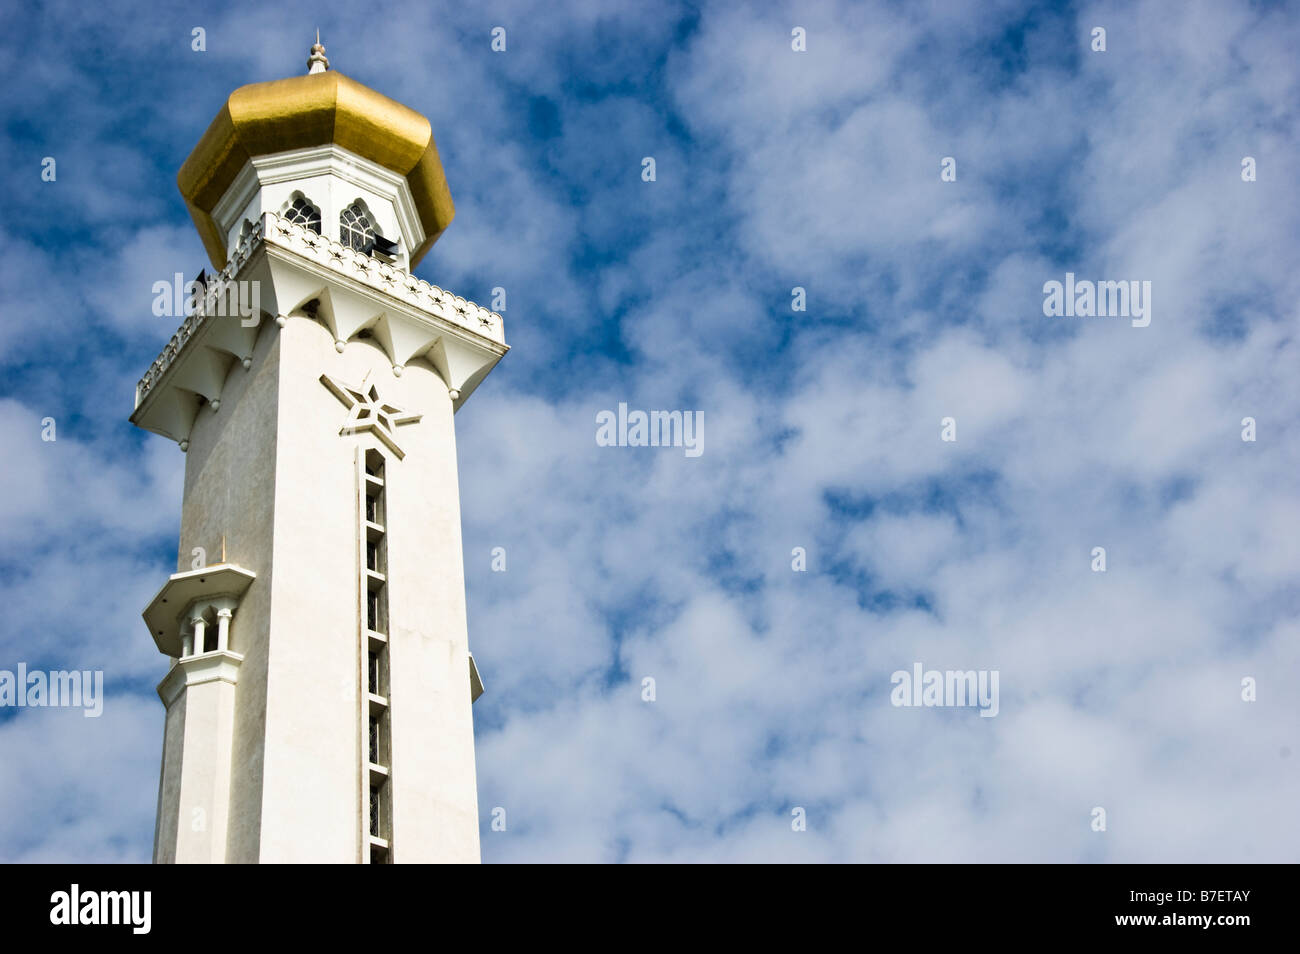 Minaret of Sultan Omar Ali Saifuddin Mosque, Bandar Seri Begawan, Brunei - Stock Image